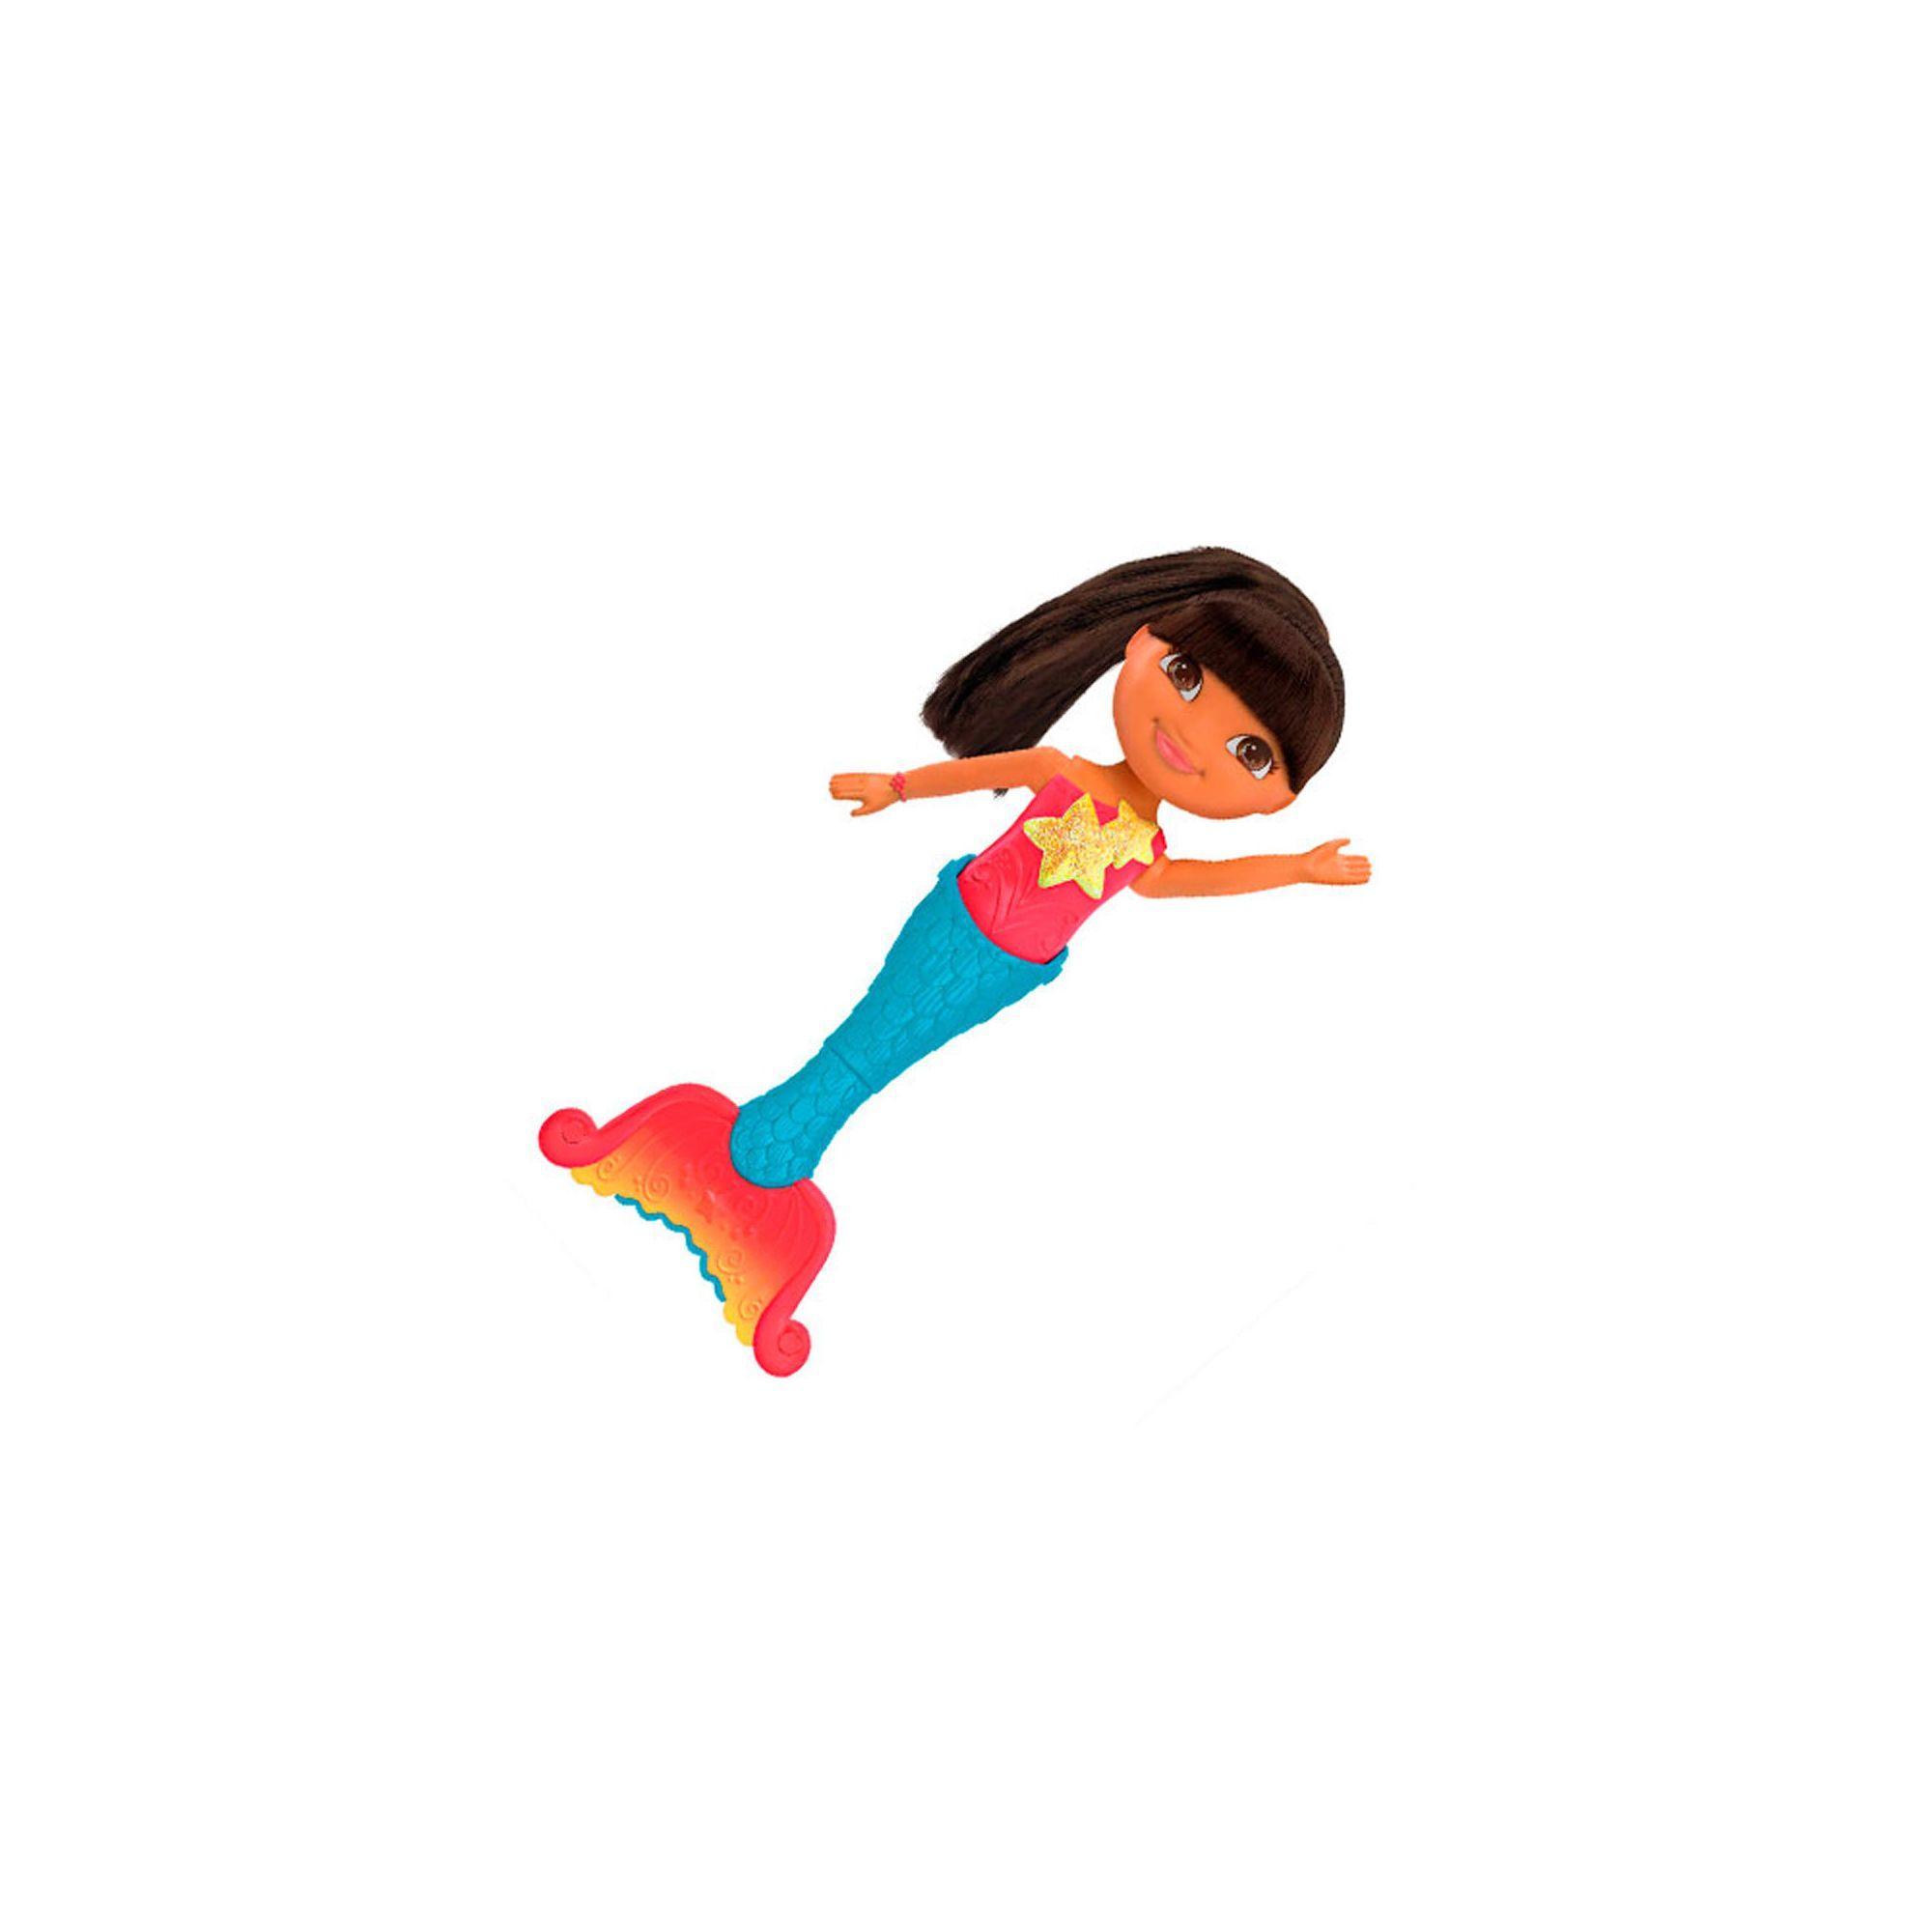 Dora The Explorer Mermaid Sparkle And Twirl Commercial: Myshop